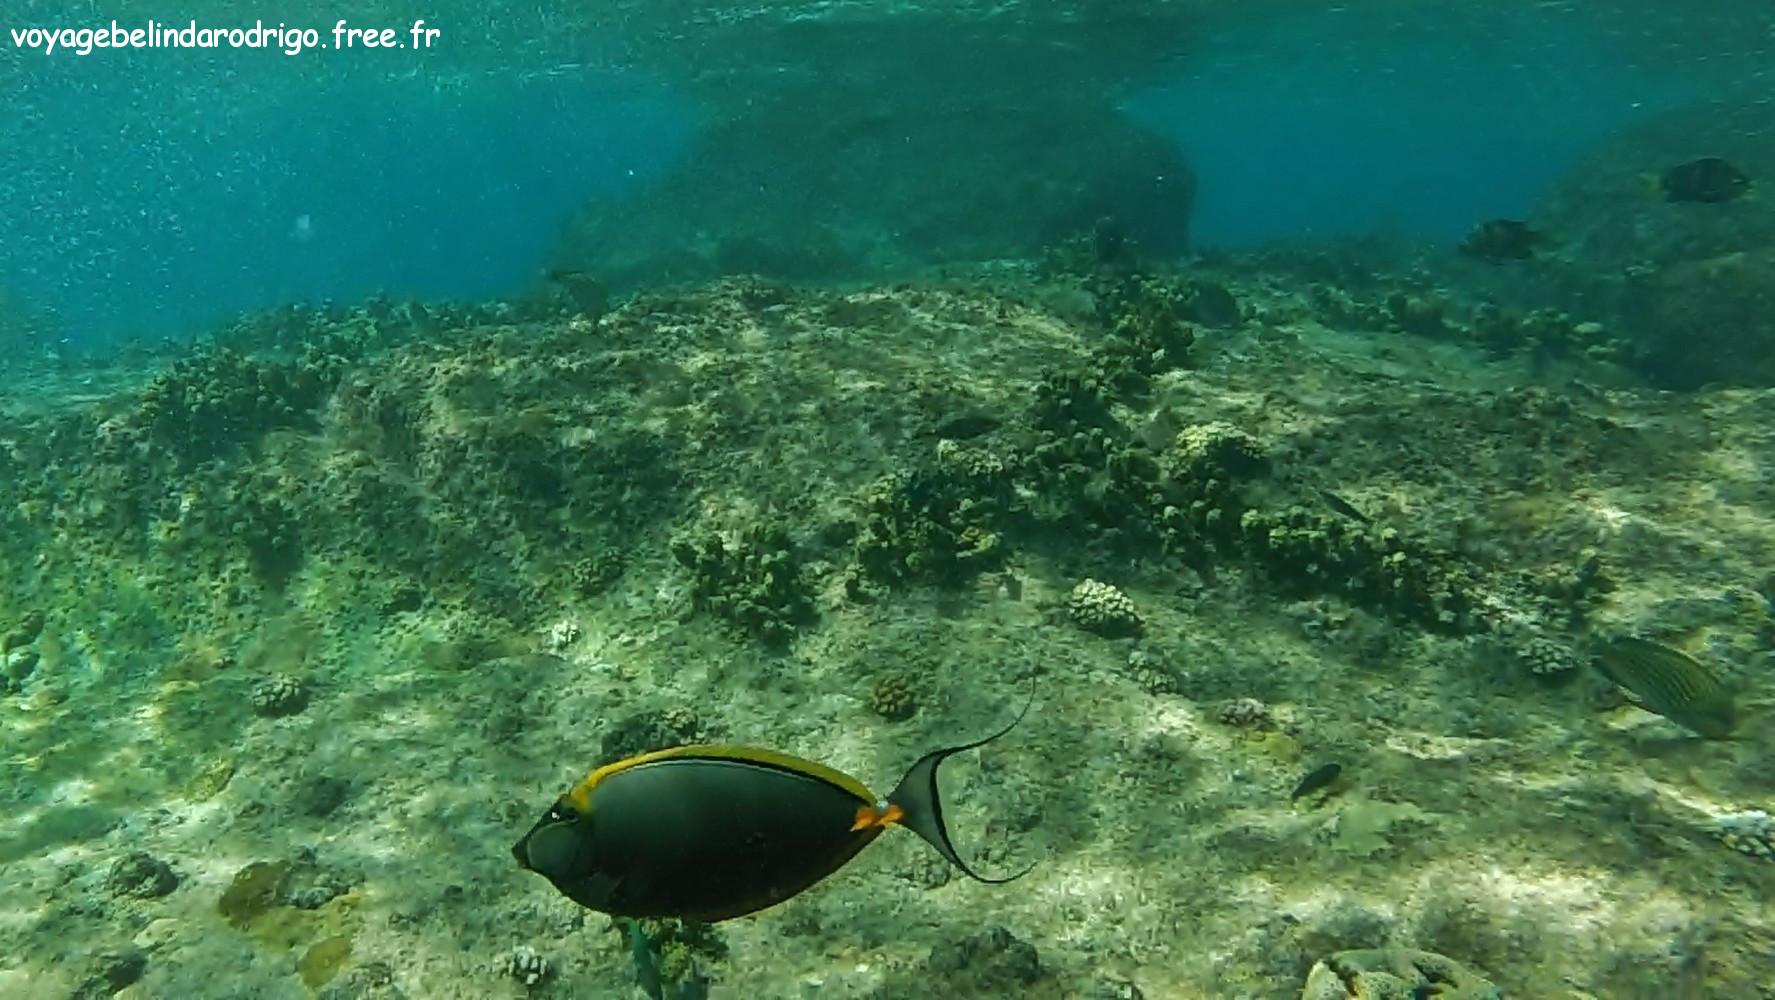 Poisson Nason Licorne  à éperon orange - Snorkeling - Îlot St Pierre - Praslin